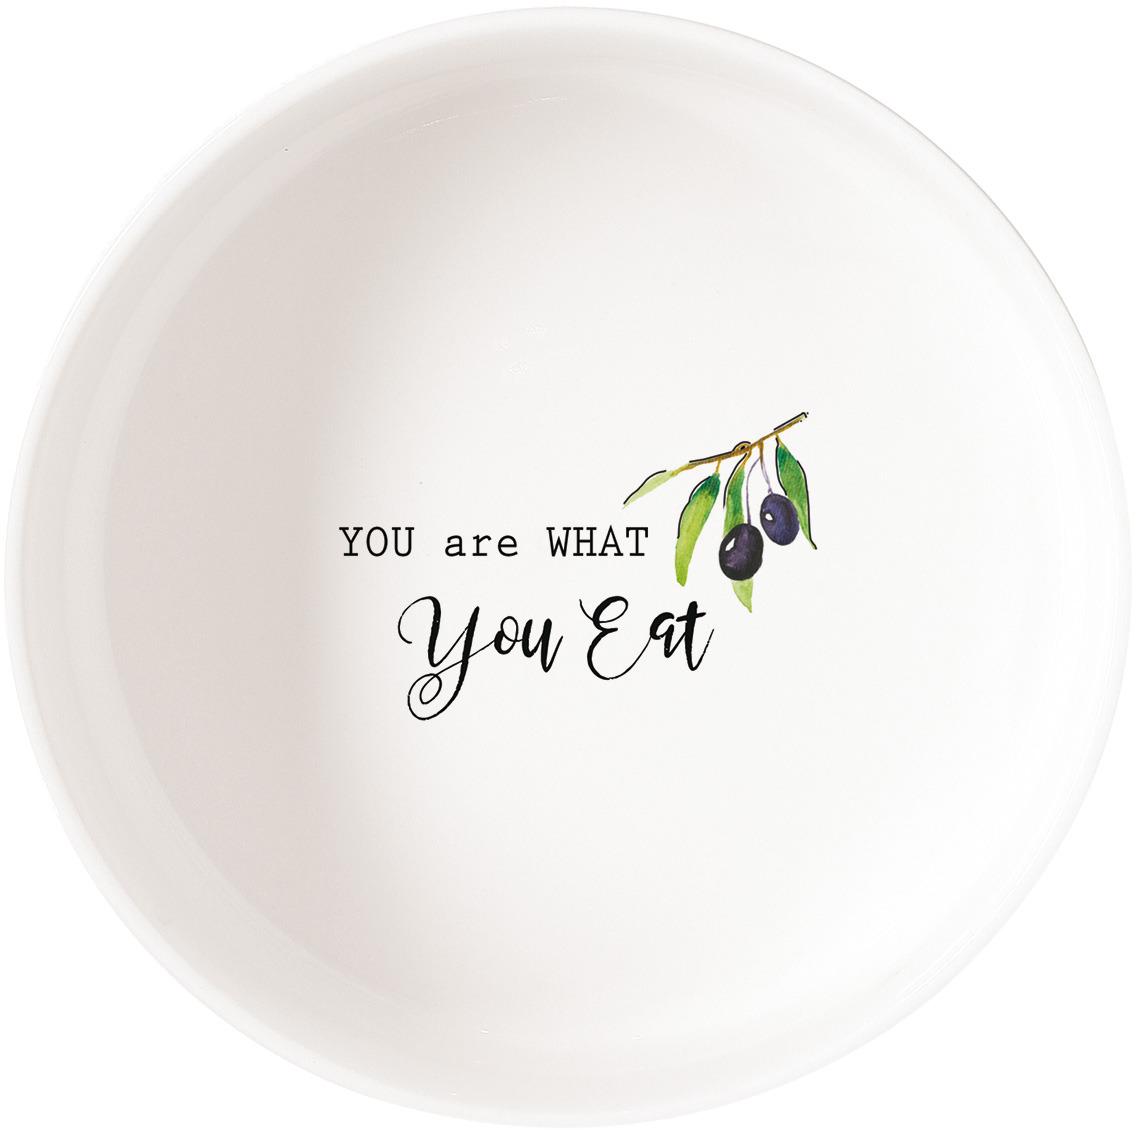 Салатник Easy Life Kitchen Elements, цвет: белый, 500 мл. EL-R1908/KITE